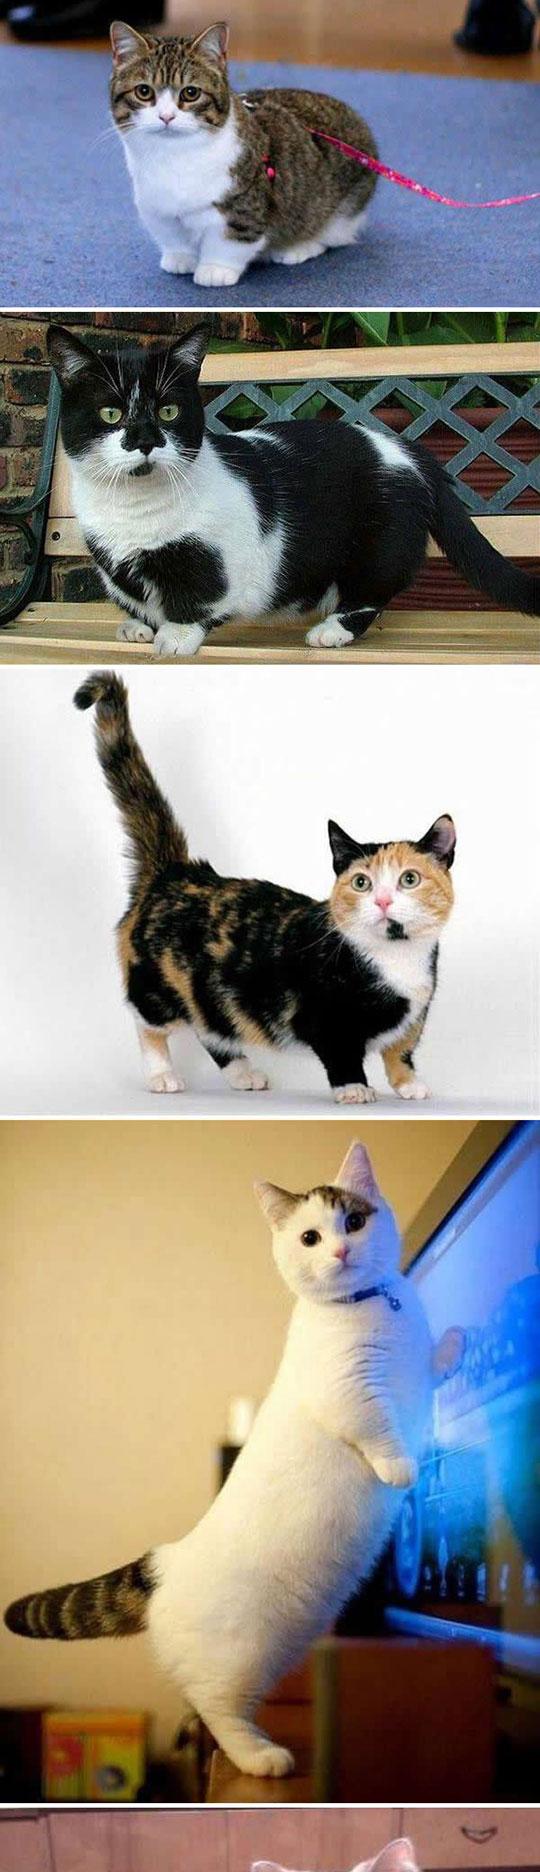 1-cute-cats-small-legs-munchkin